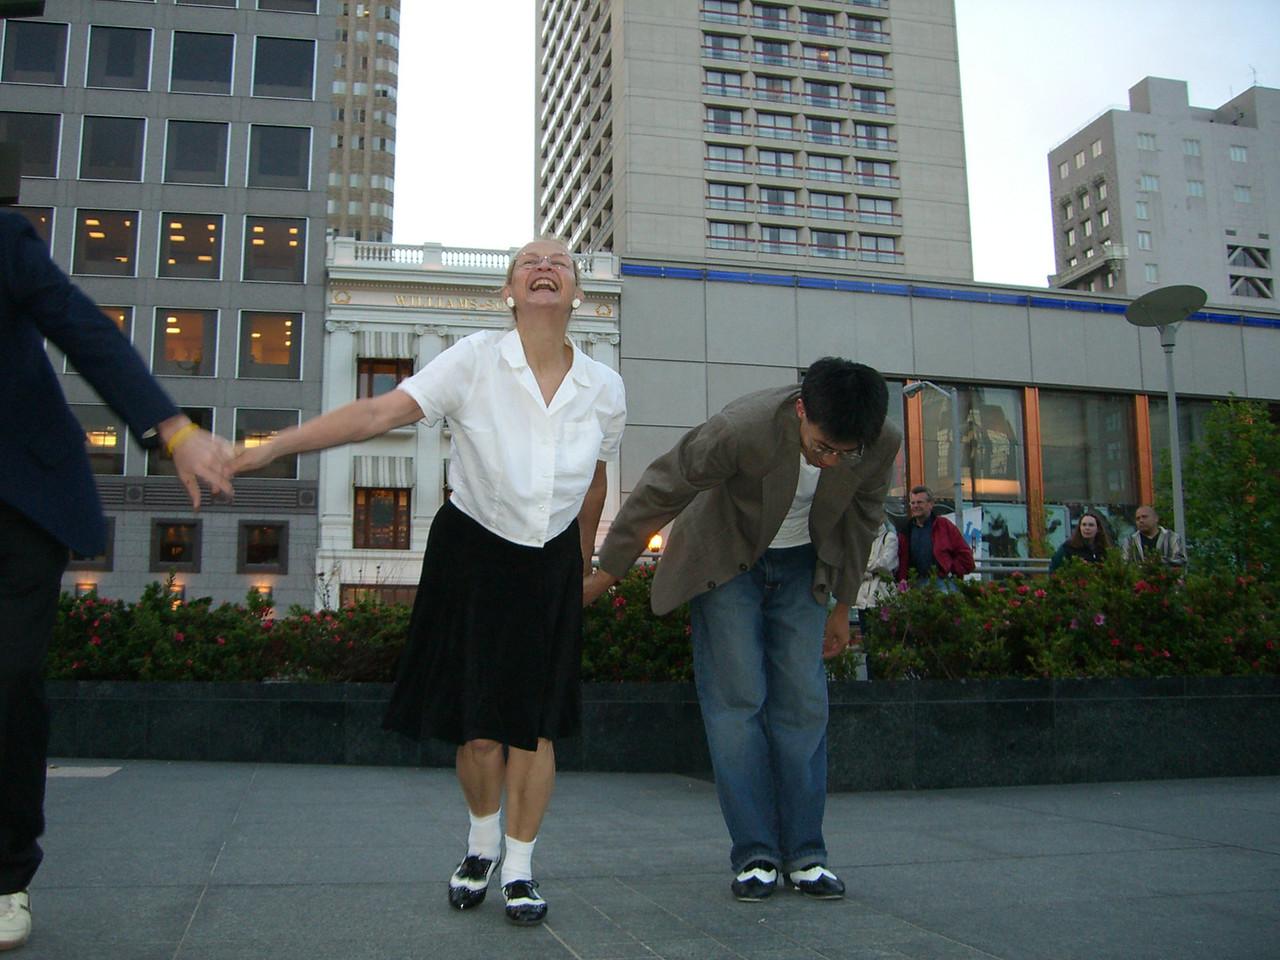 2006 05 03 Wed - Sharon Crocker & Ben Yu after Union Square 'Jam Session' performance 1